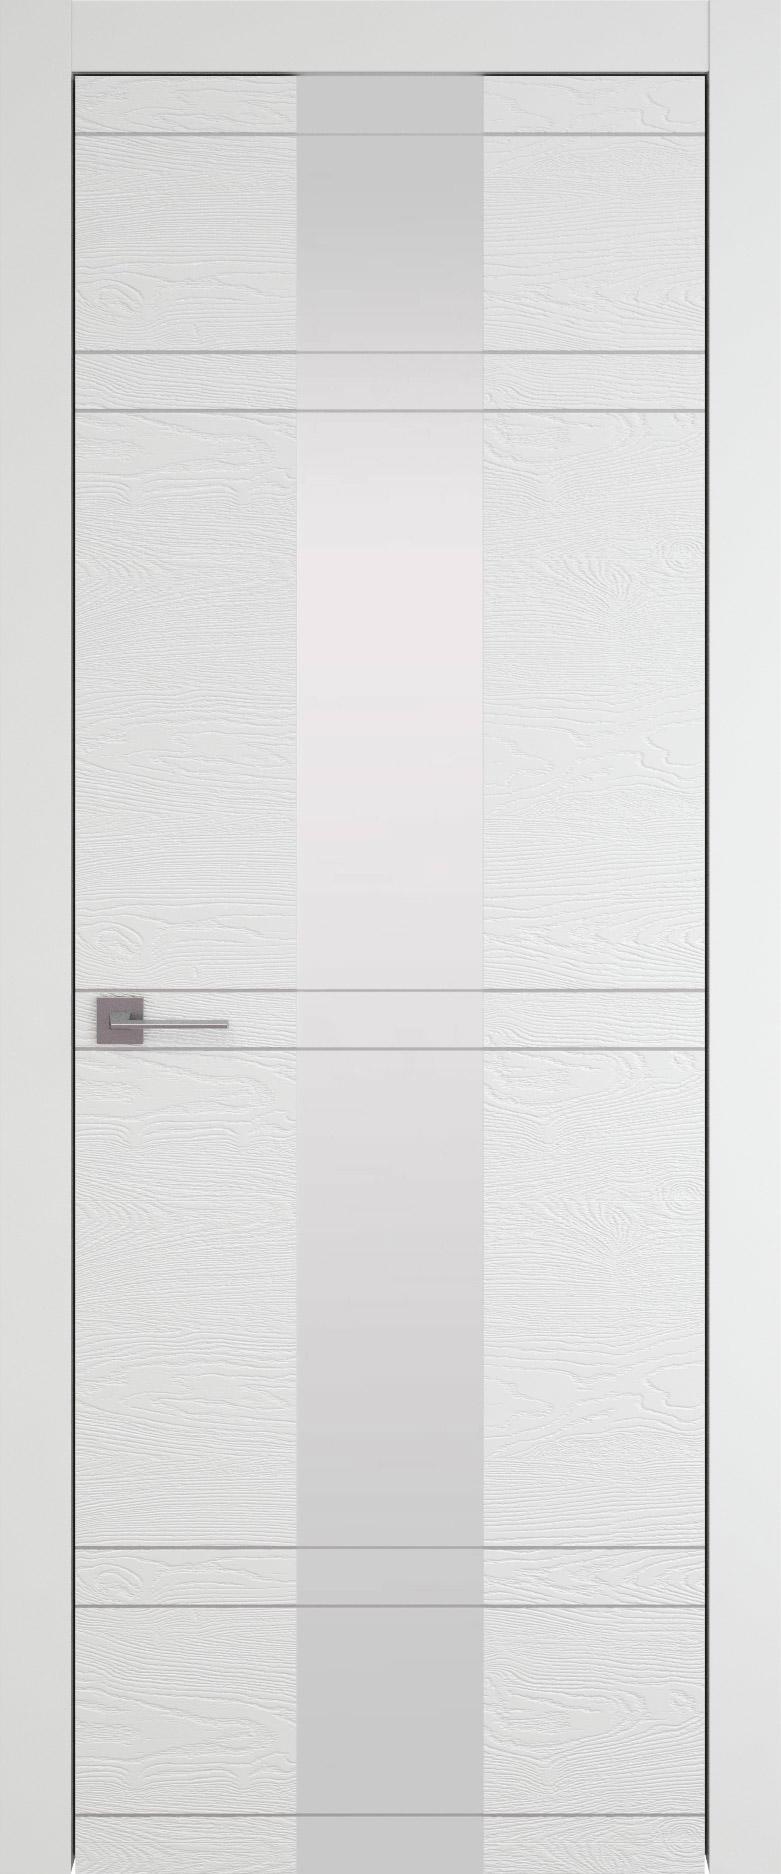 Tivoli Ж-4 цвет - Белая эмаль по шпону (RAL 9003) Со стеклом (ДО)